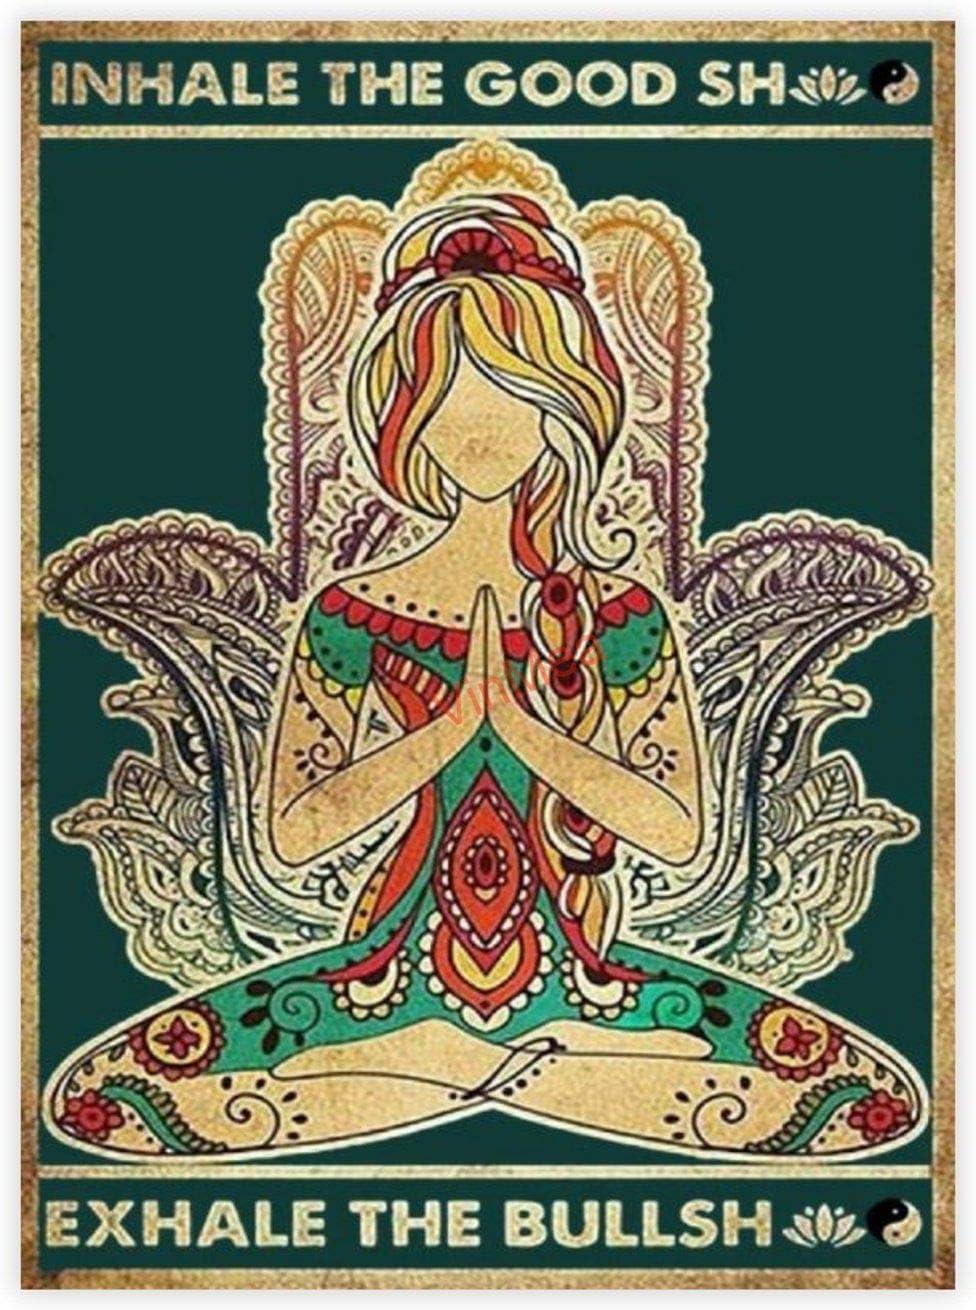 VinMea Decorative Art Printing Poster Yoga Girl Inhale The Good Shit Exhale The Bullshit Poster - Wall Art Print Home Decor 16 X 24 Inch Unframed